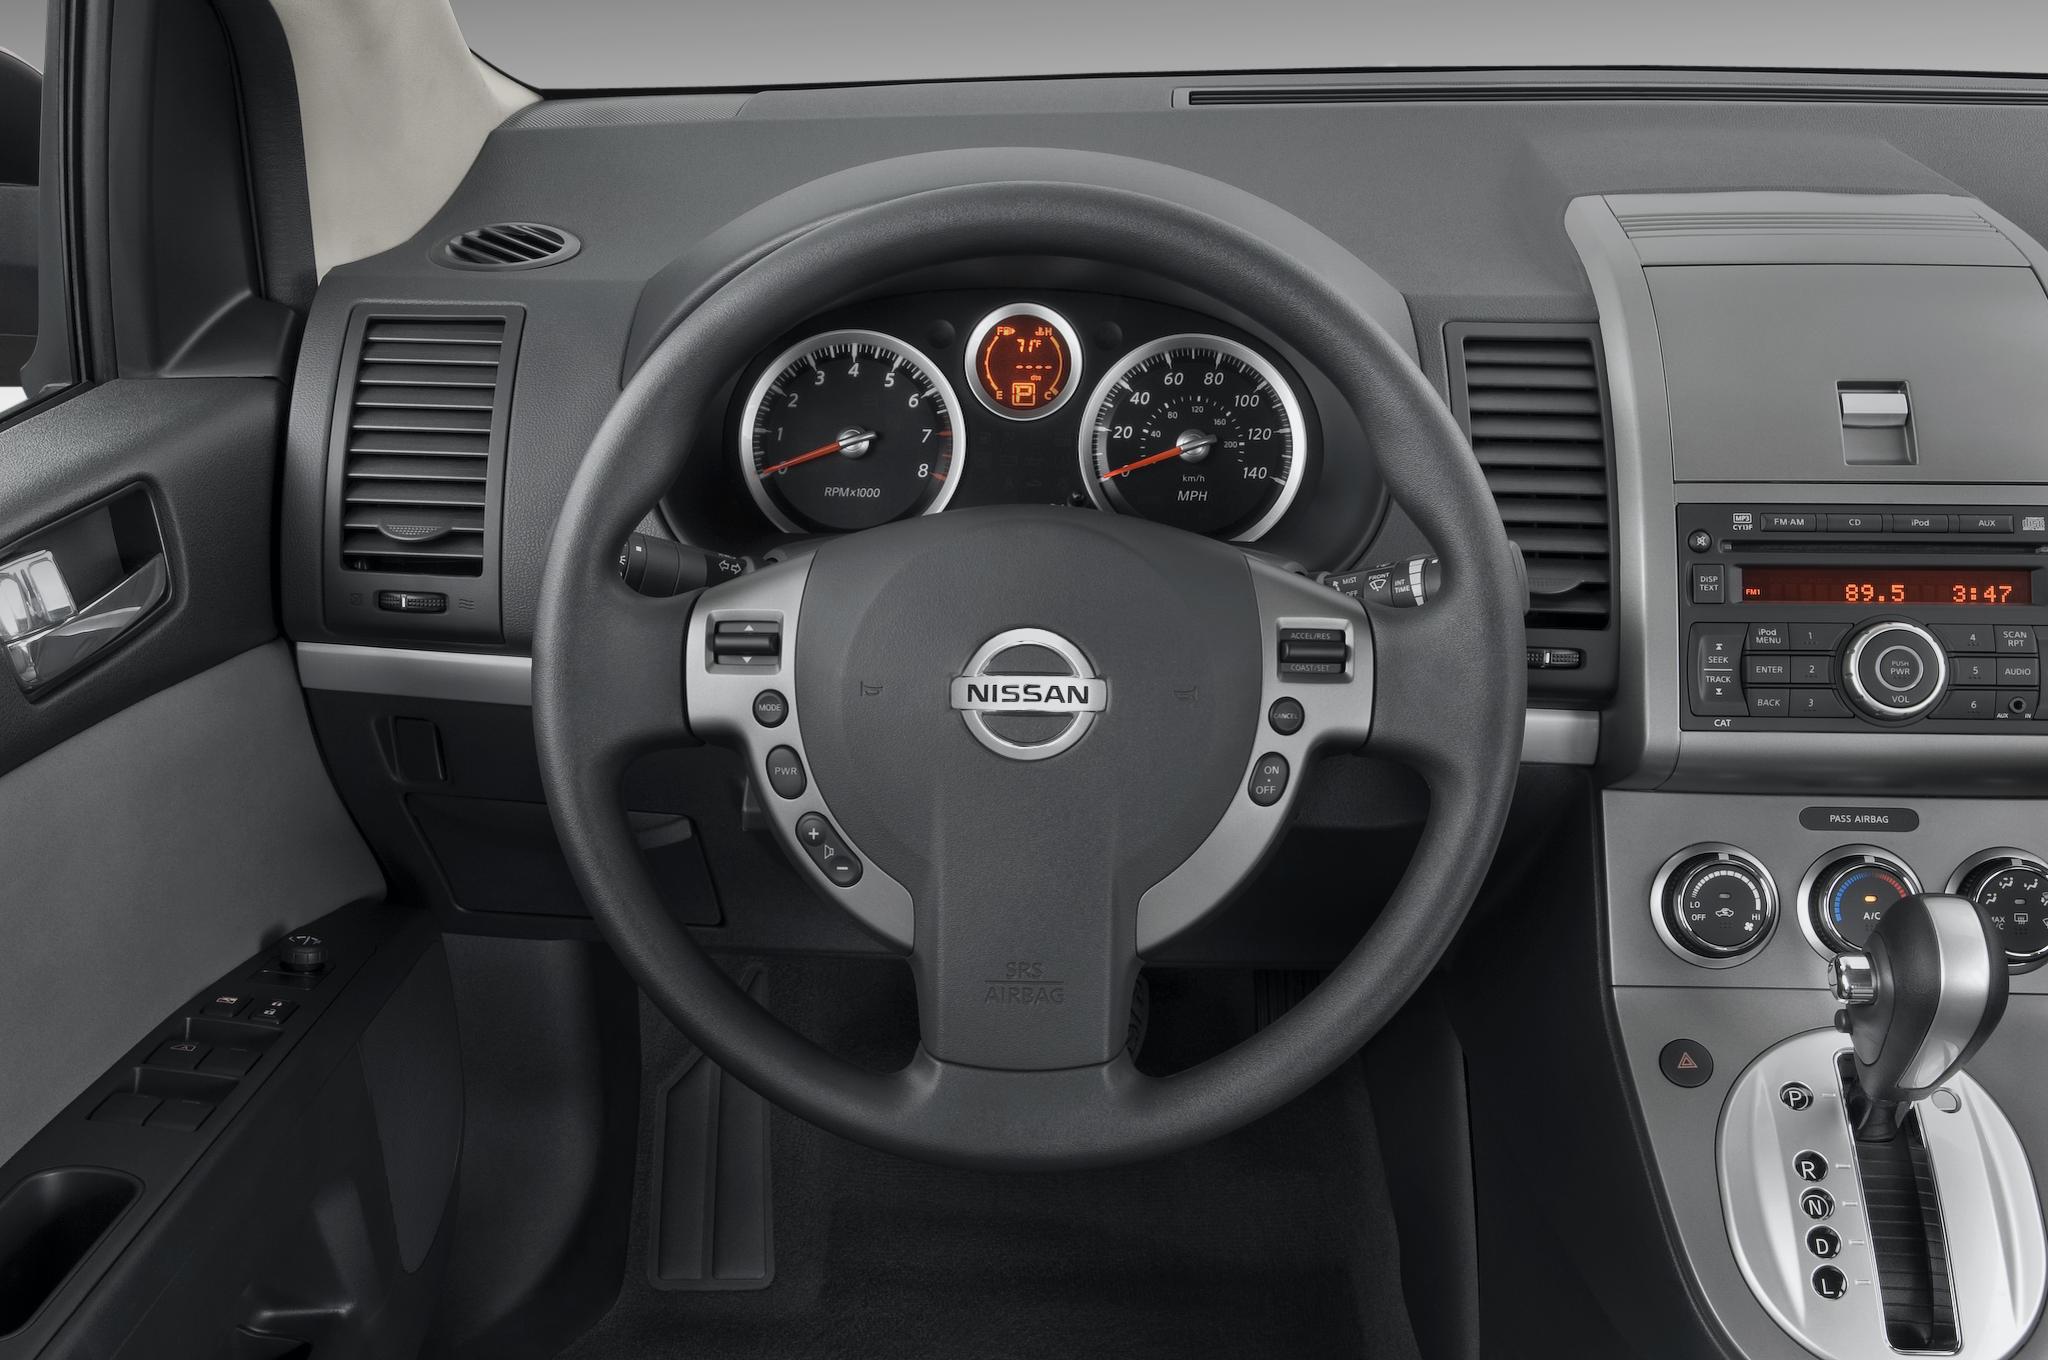 2010 nissan sentra se r nissan compact sedan review automobile rh automobilemag com nissan sentra 2013 manual nissan sentra 2010 service manual